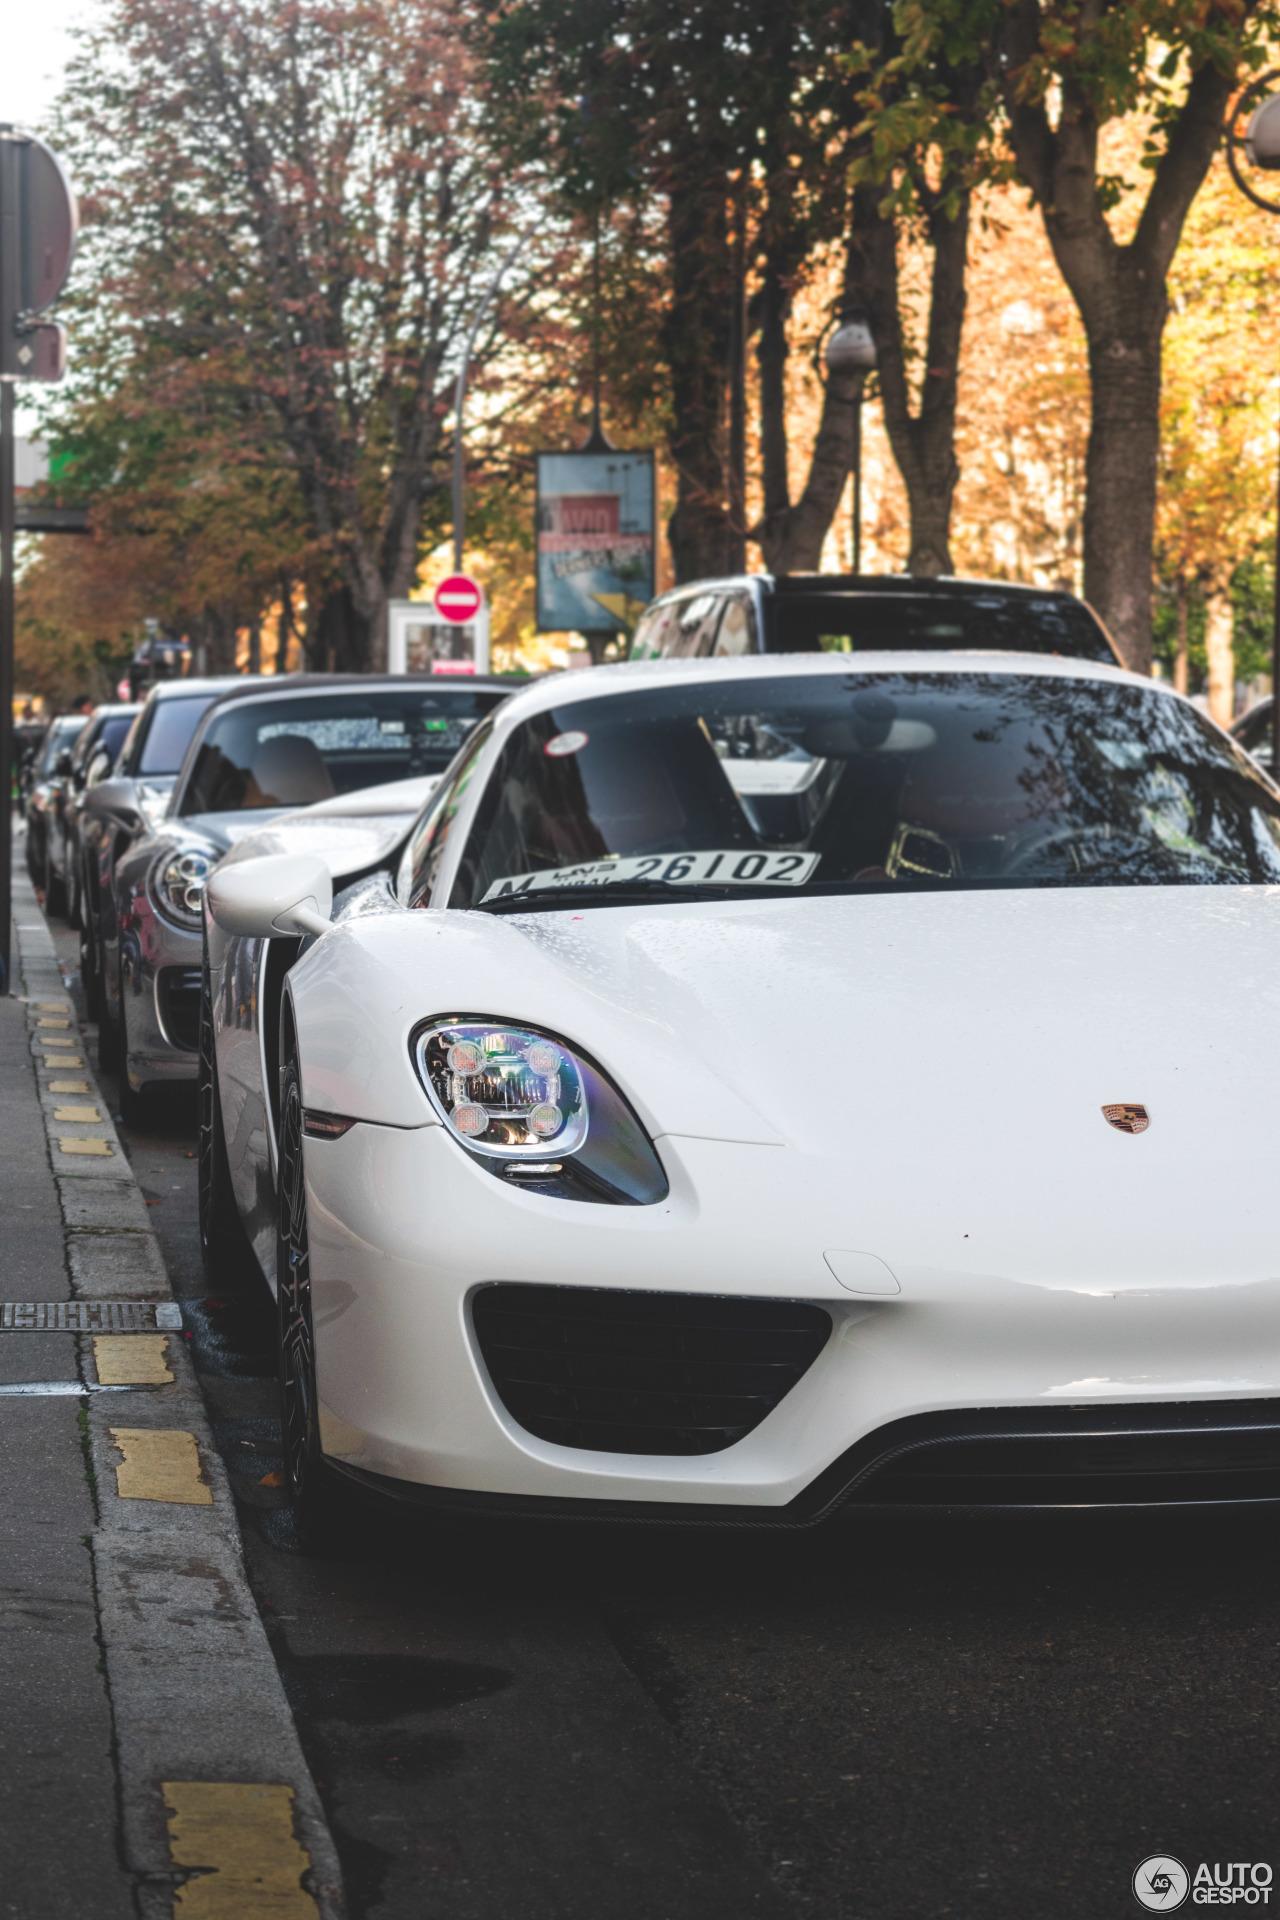 porsche-918-spyder-c604921102017231850_6 Remarkable Porsche 918 Spyder On the Road Cars Trend